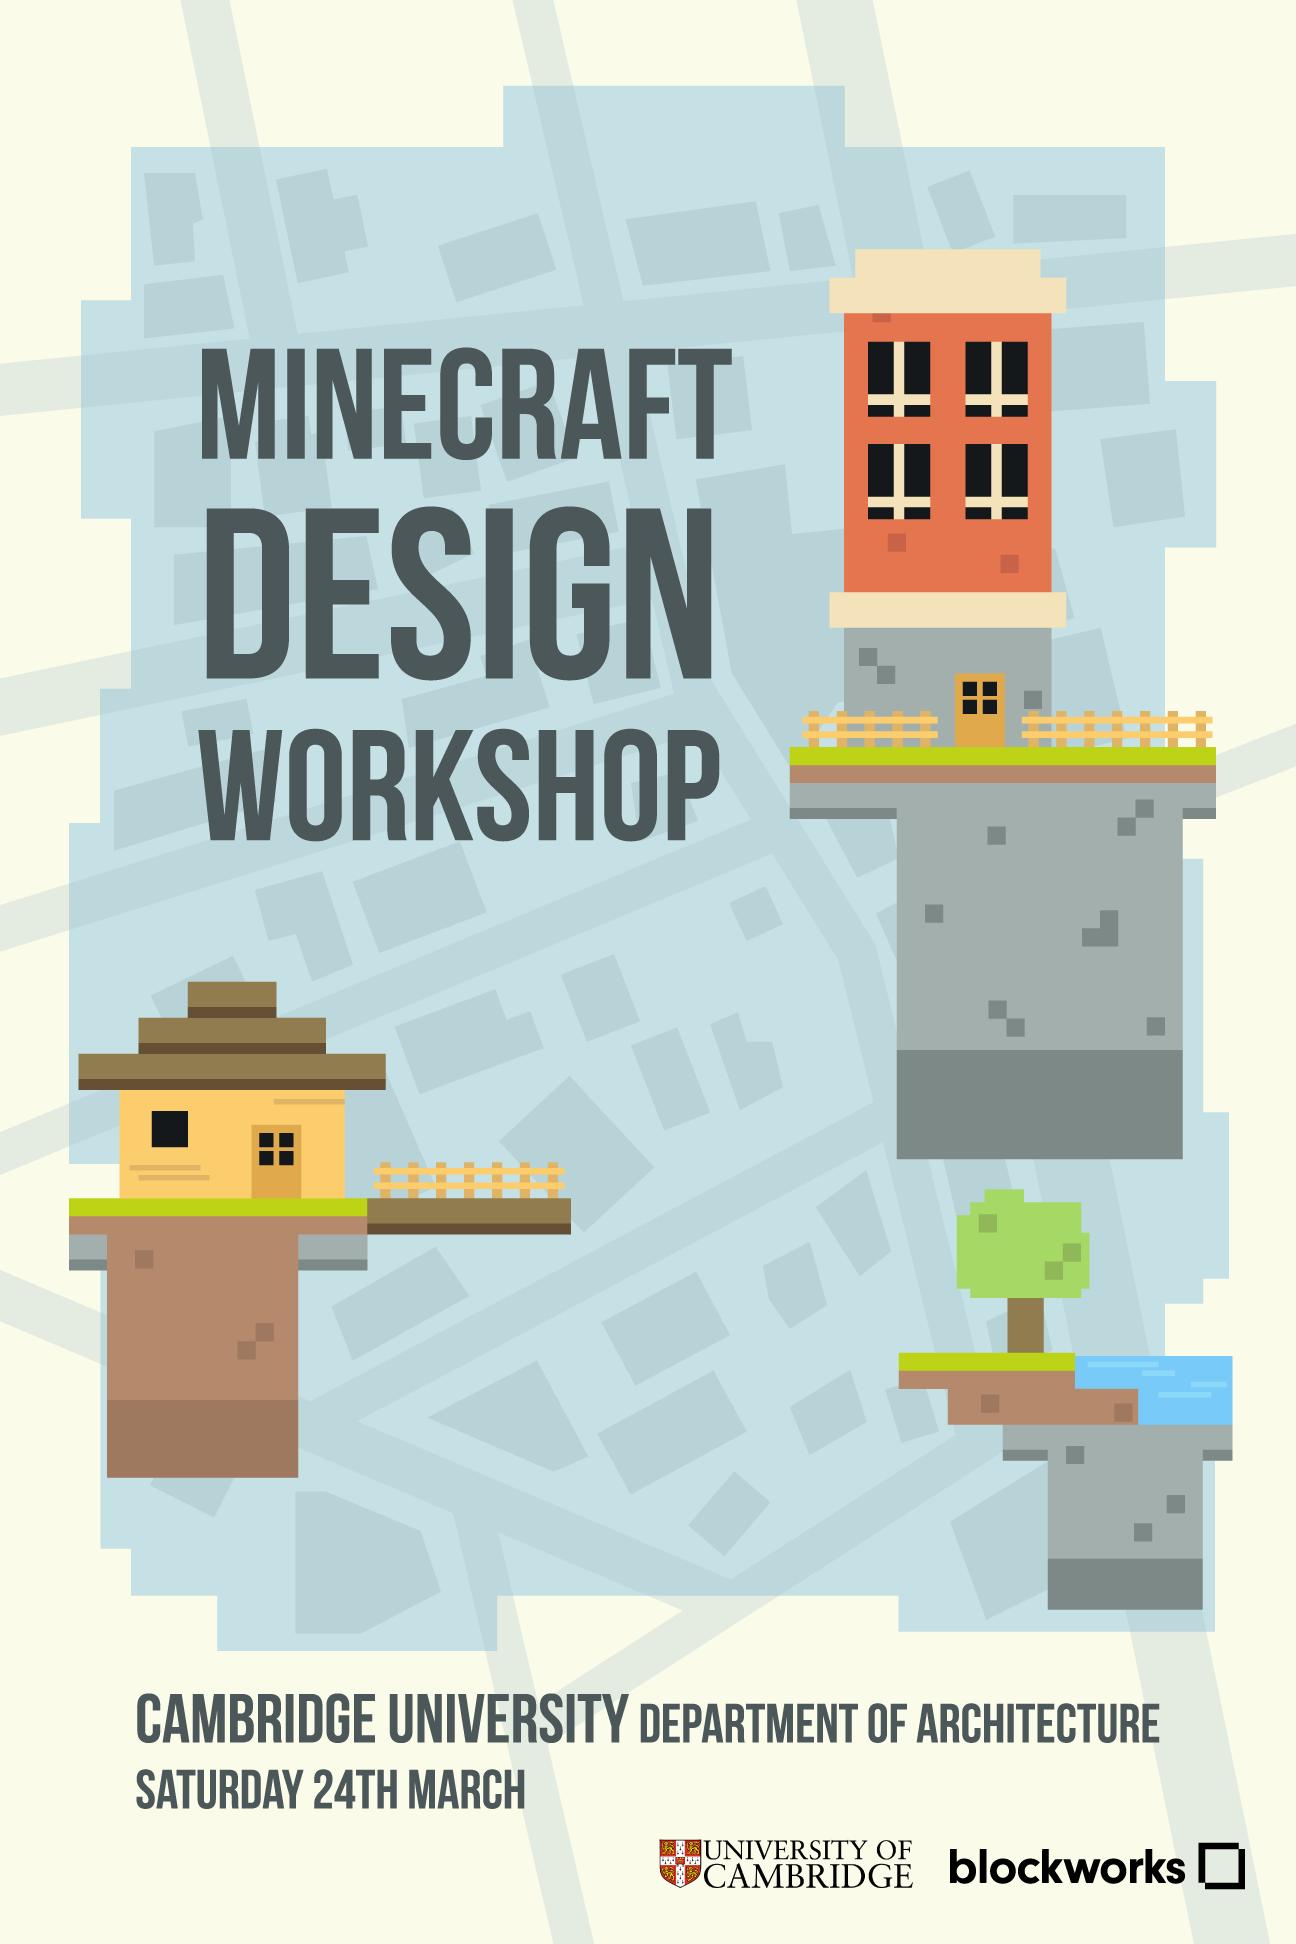 MinecraftDesignWorkshop_Poster.png